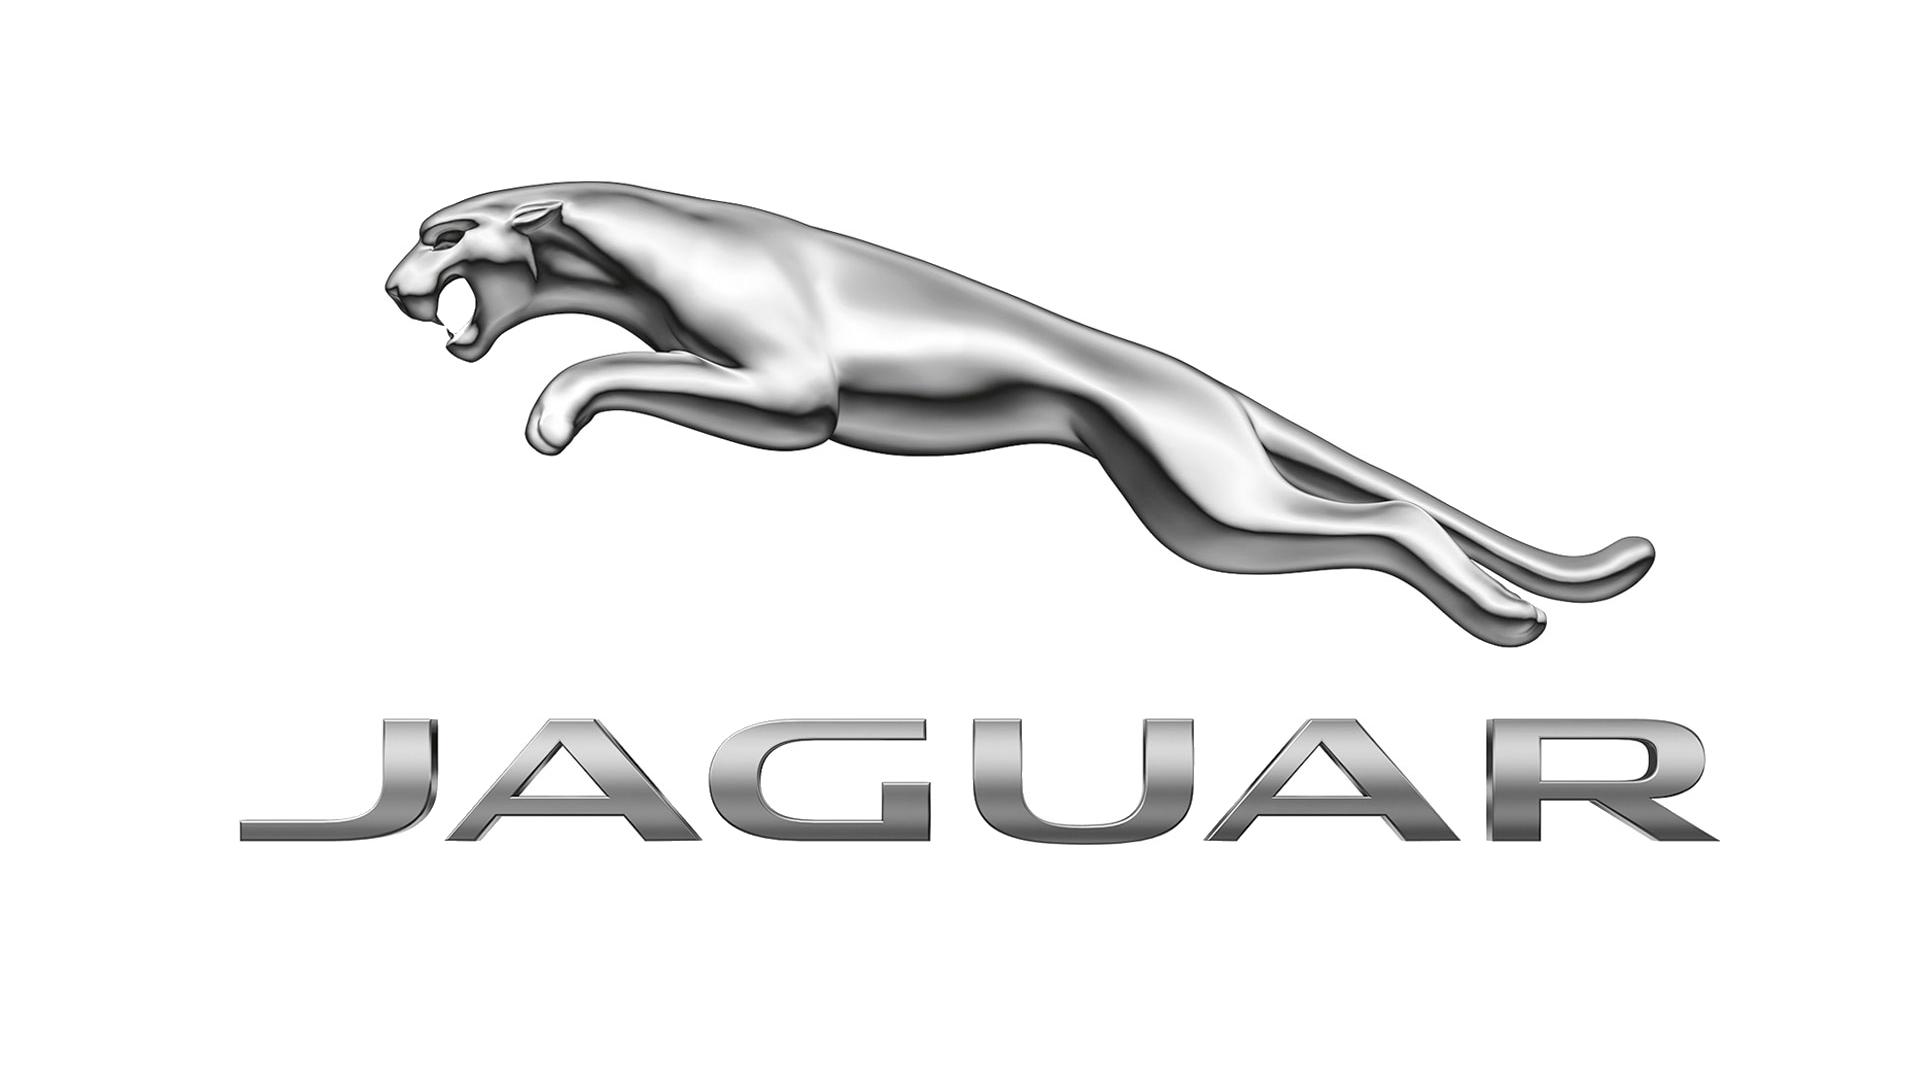 Jaguar clipart team. Png black and white